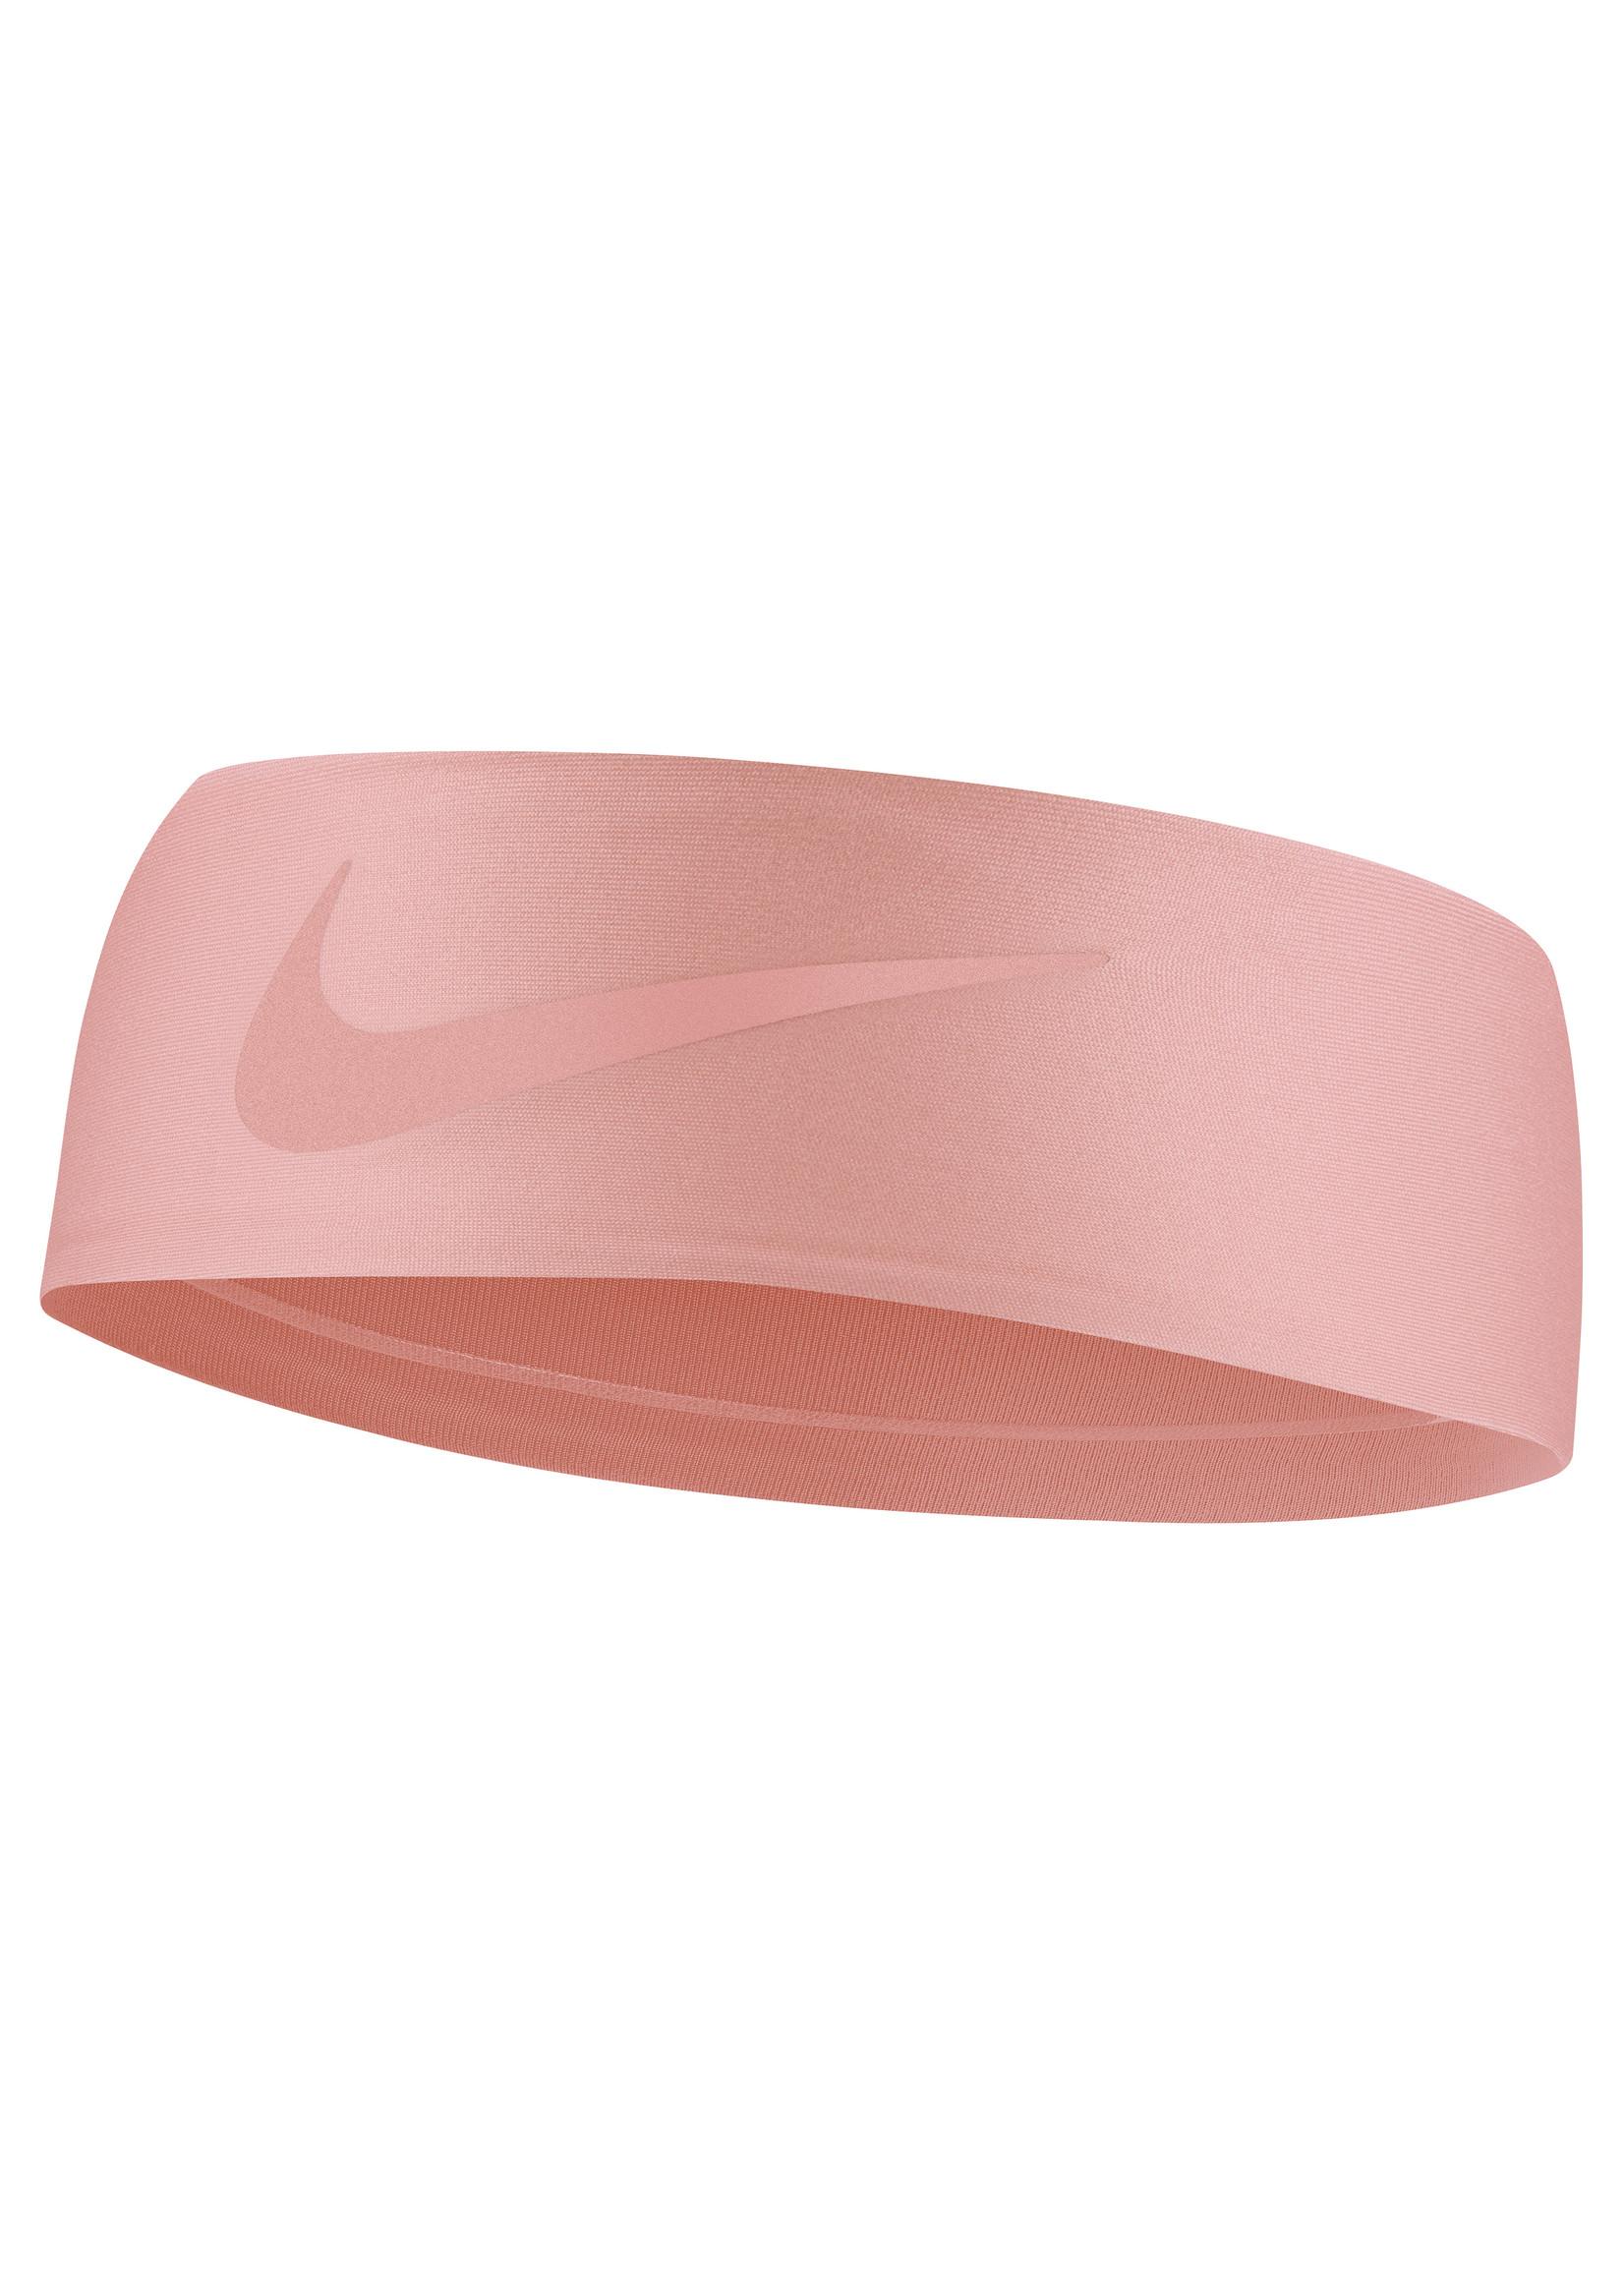 Nike Fury Headband Glitter Pink